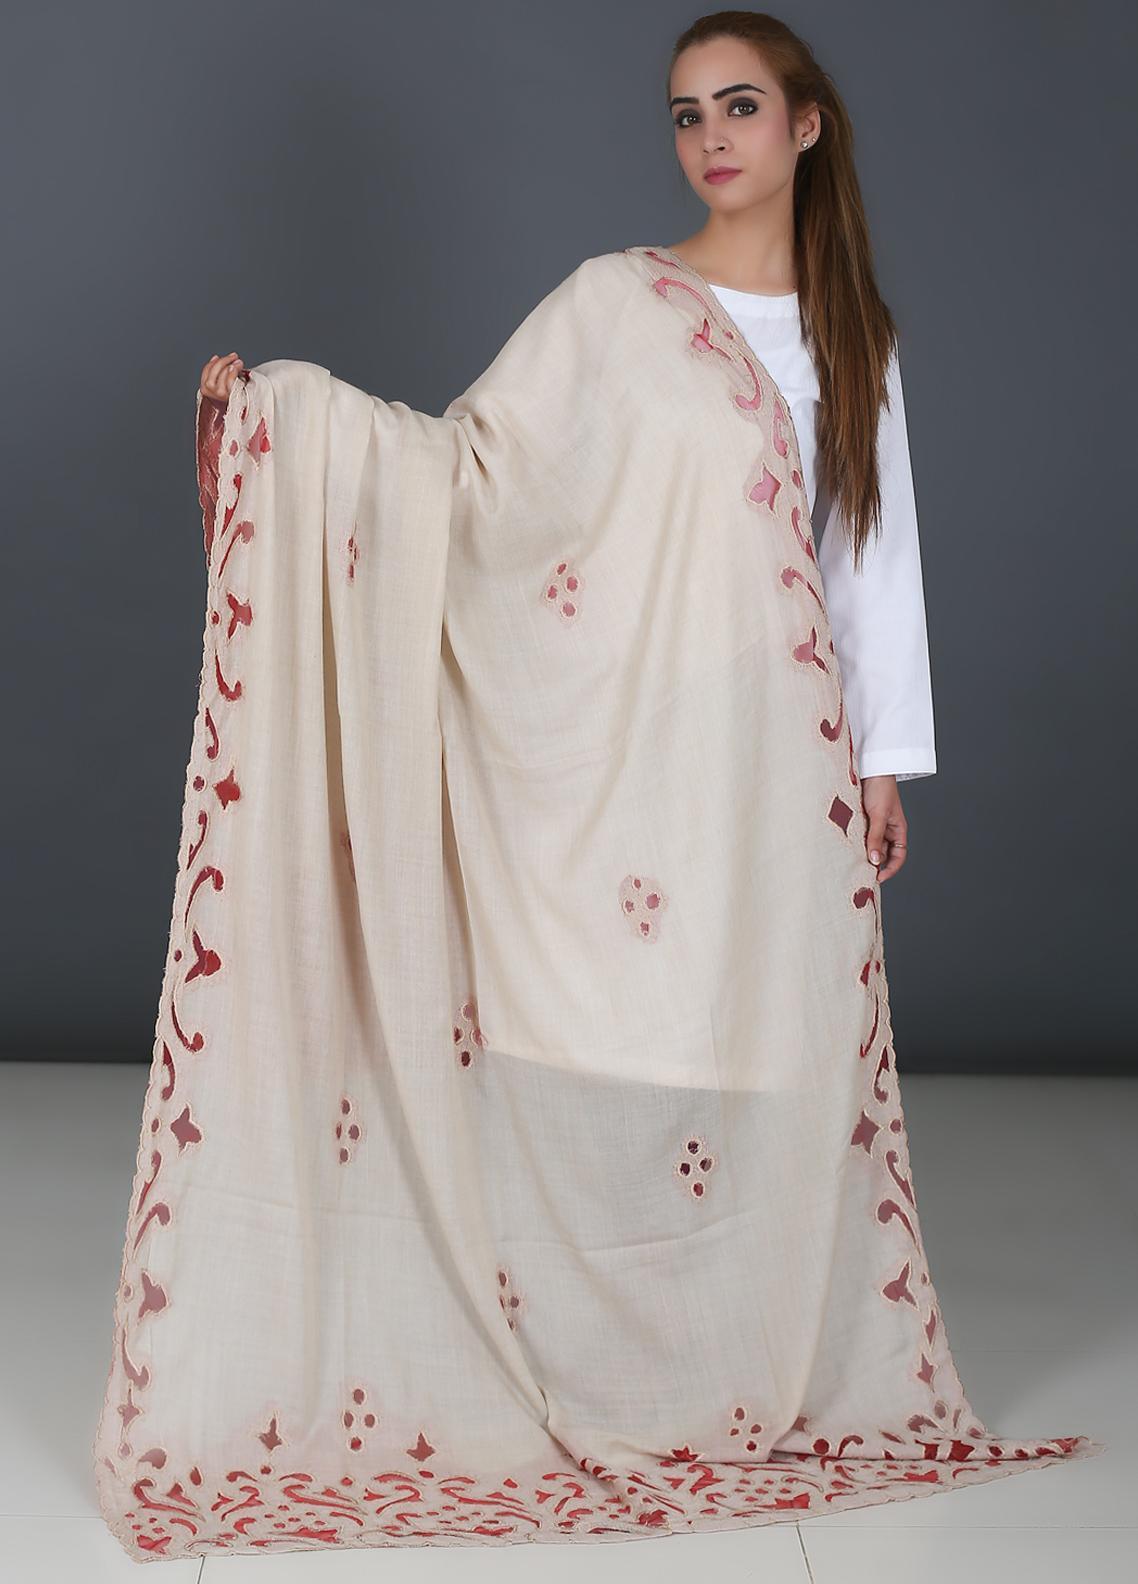 Sanaulla Exclusive Range Cutwork Pashmina  Shawl 566 Beige - Kashmiri Shawls